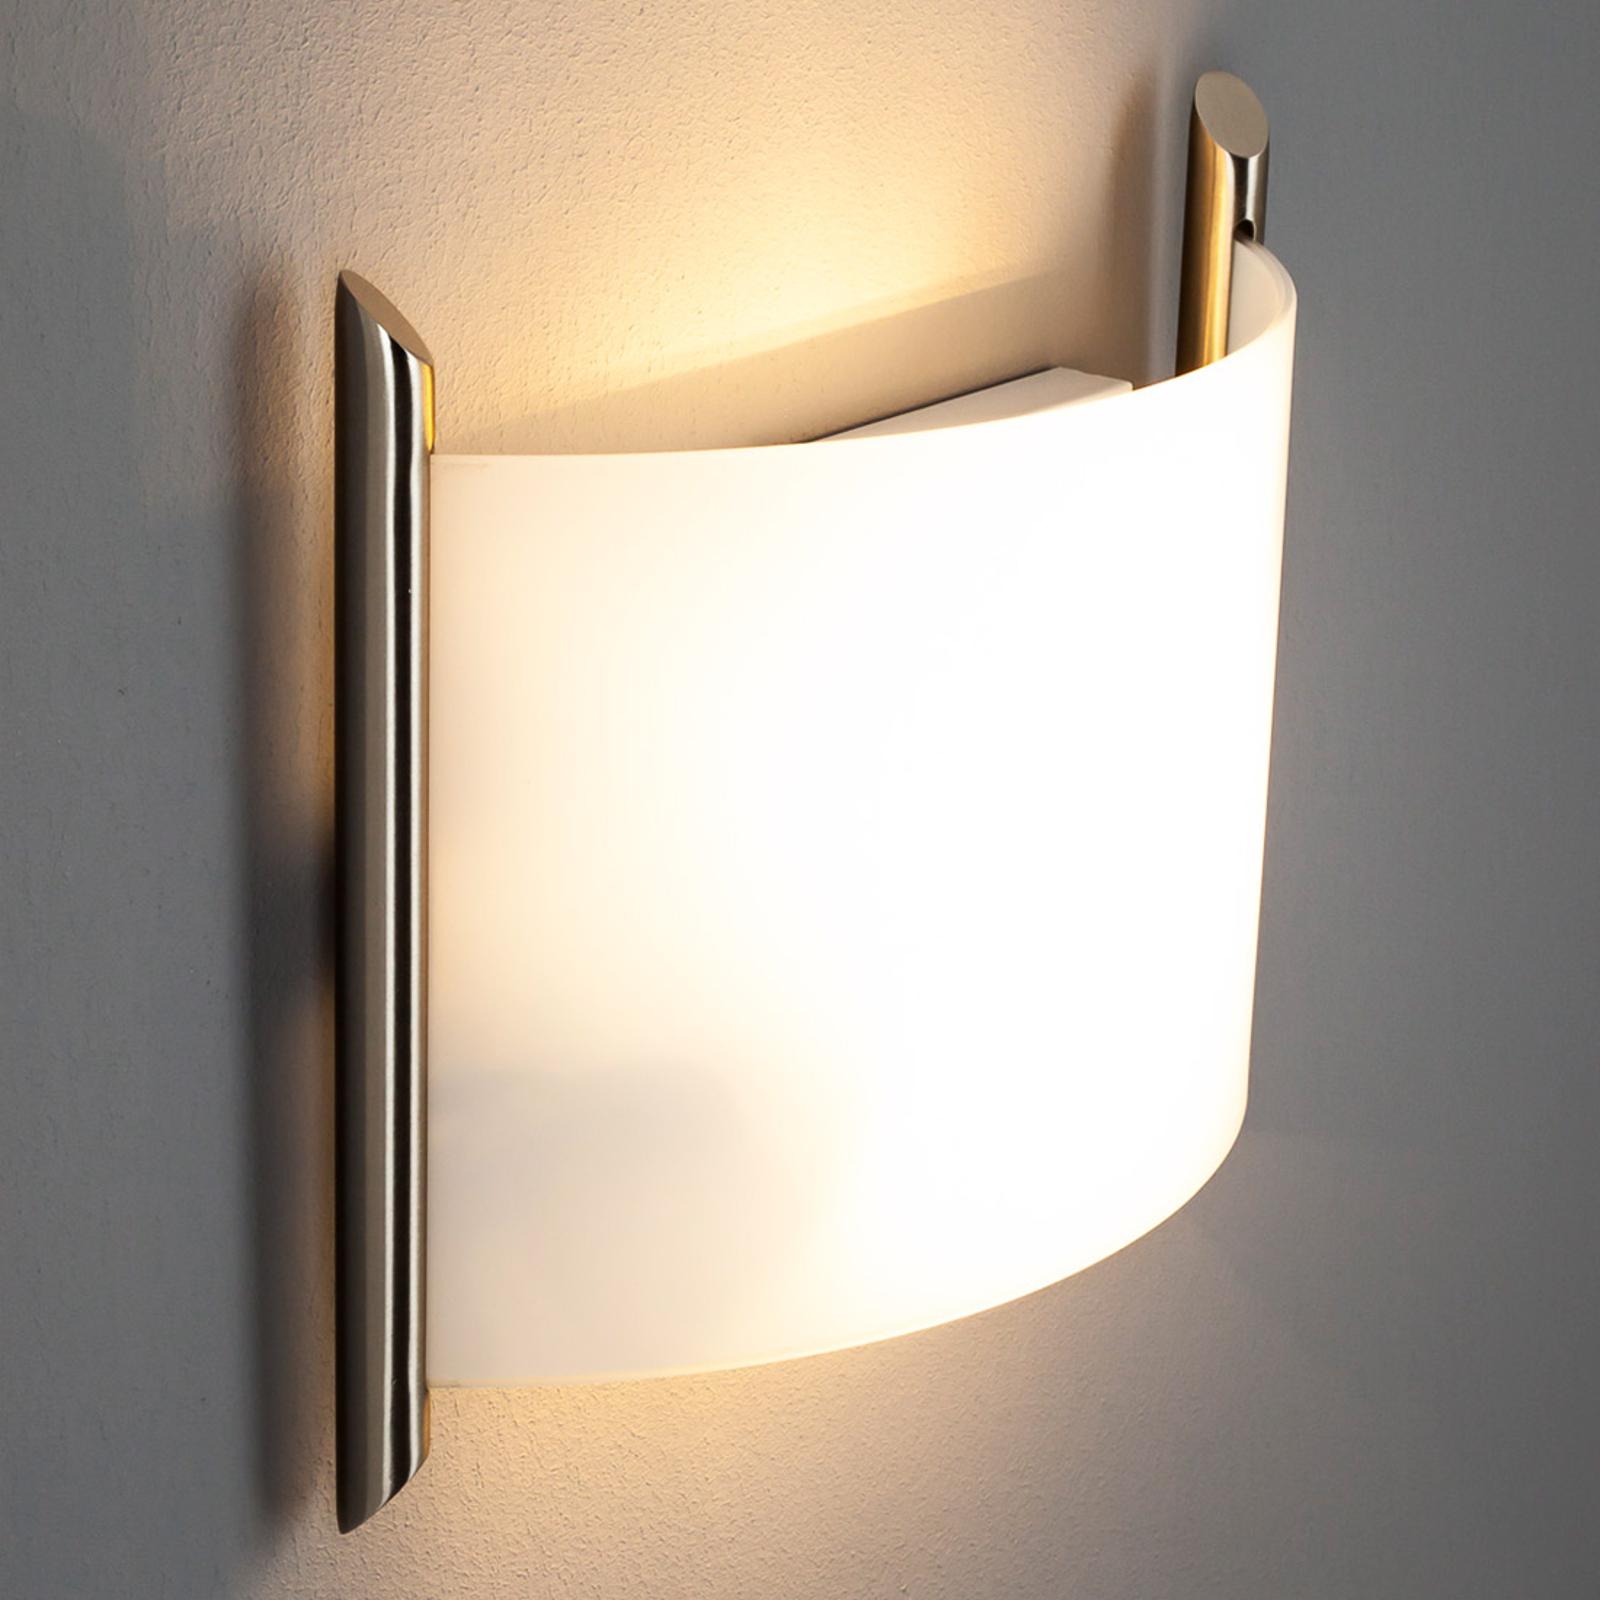 Wandlamp Filippa, 31 cm, nikkel gesatineerd